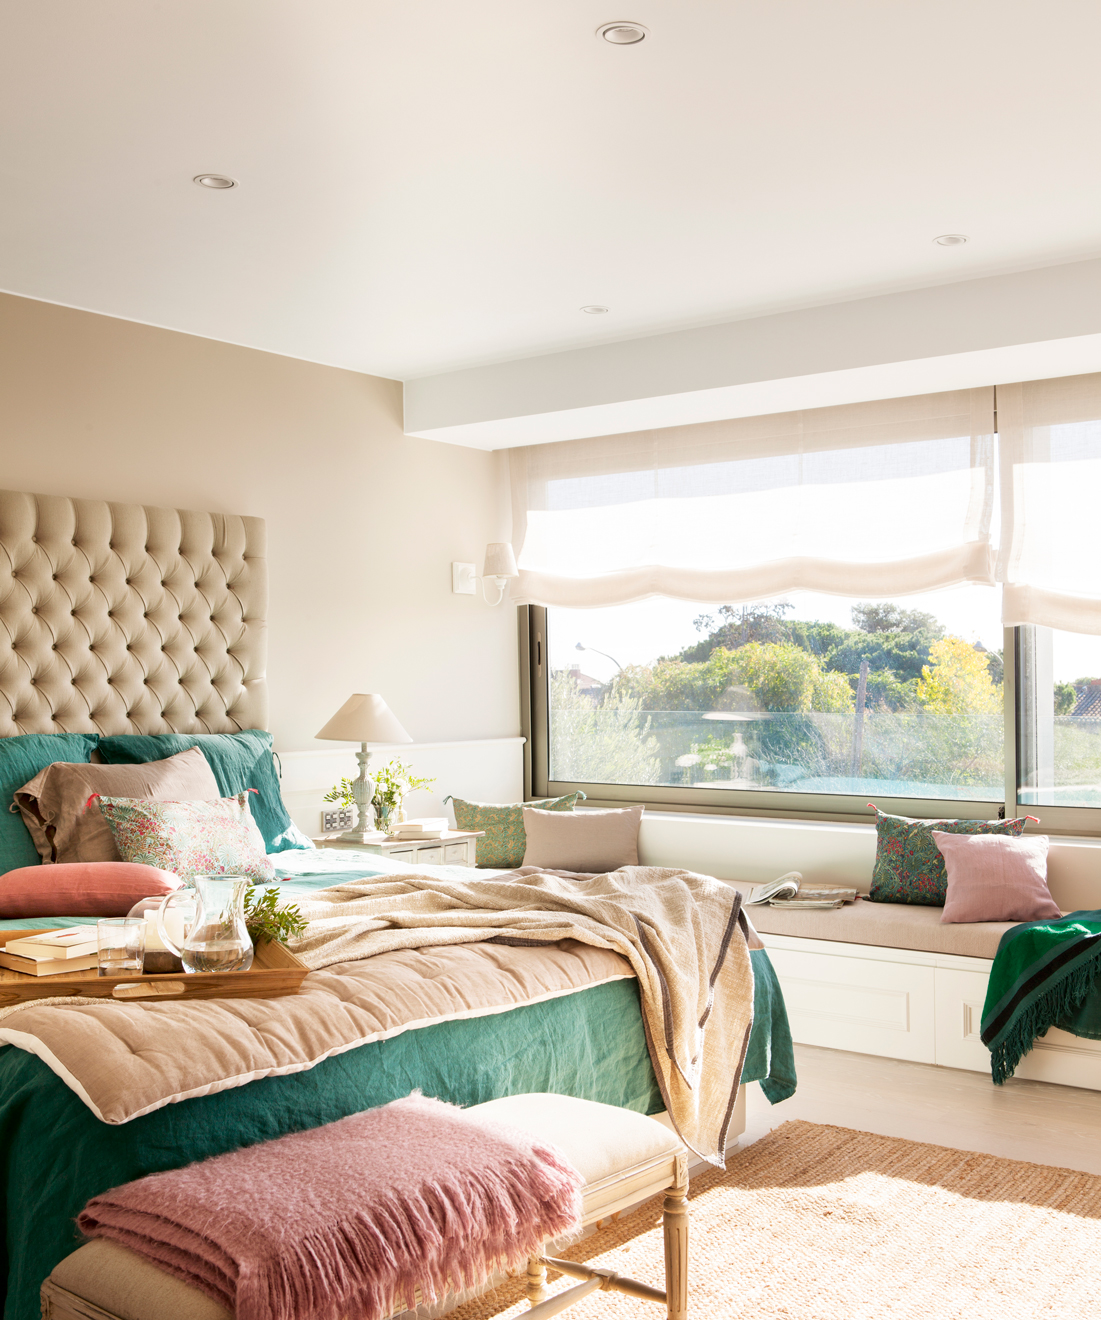 00421211. Dormitorio con cabecero tapizado en capitoné XL 00421211